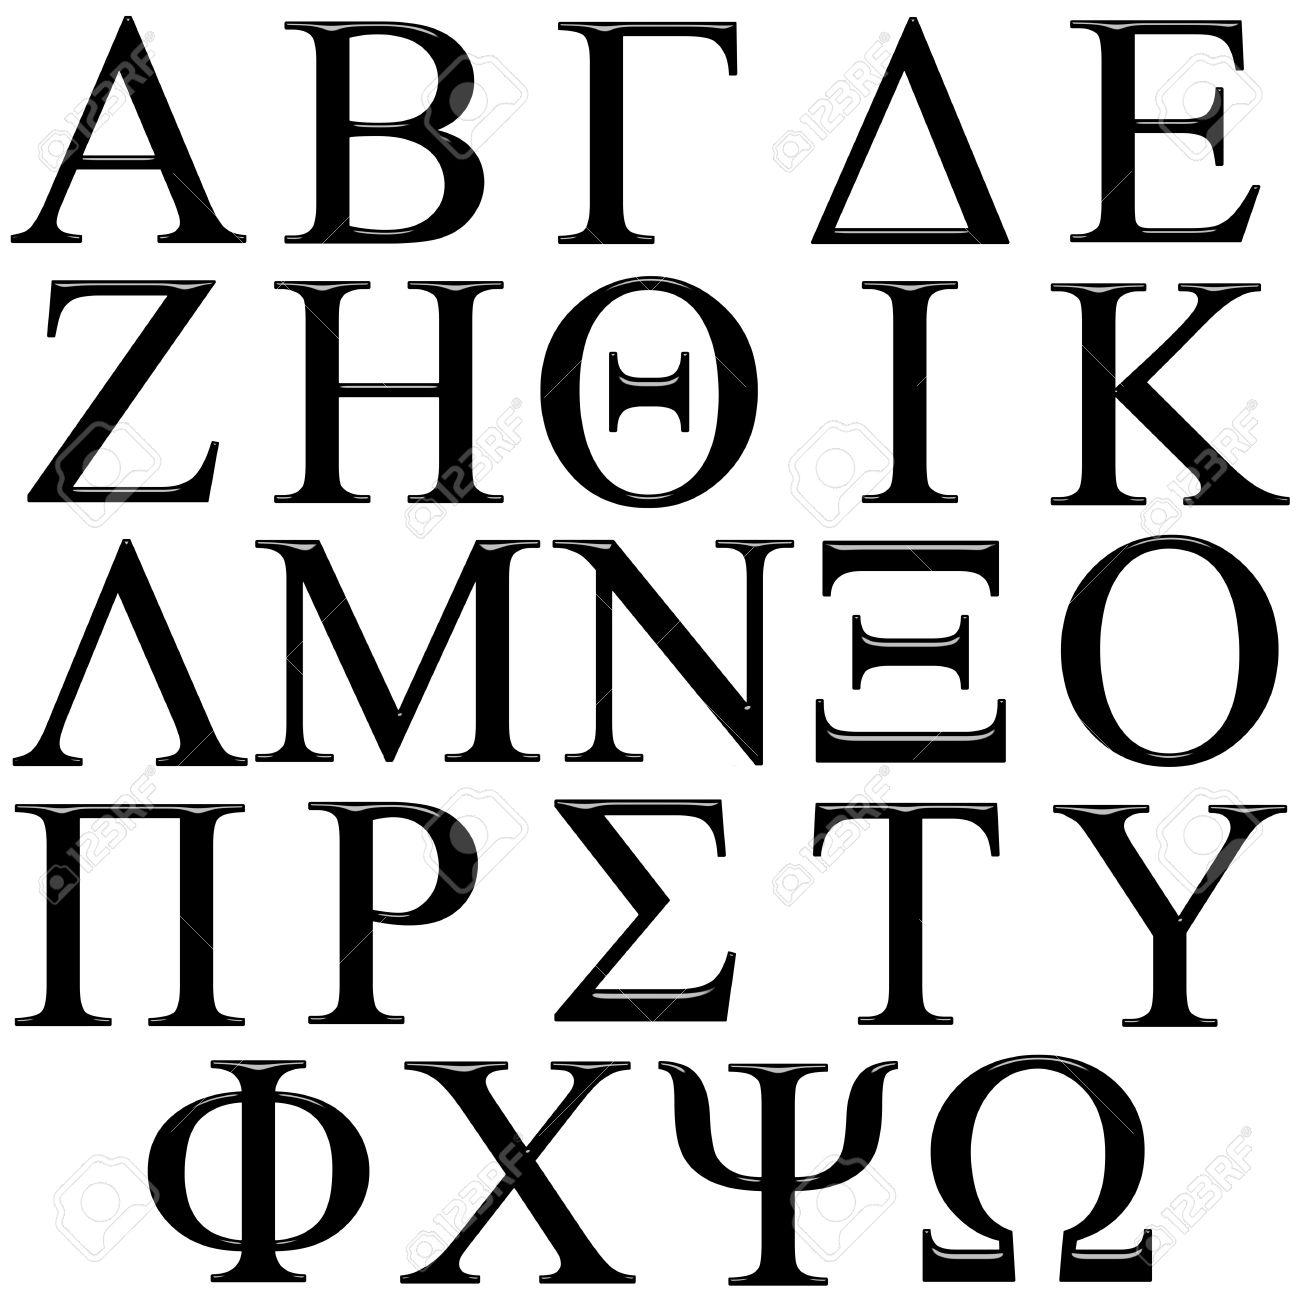 Greece clipart greek alphabet Alphabet Clipart the Clipart #1